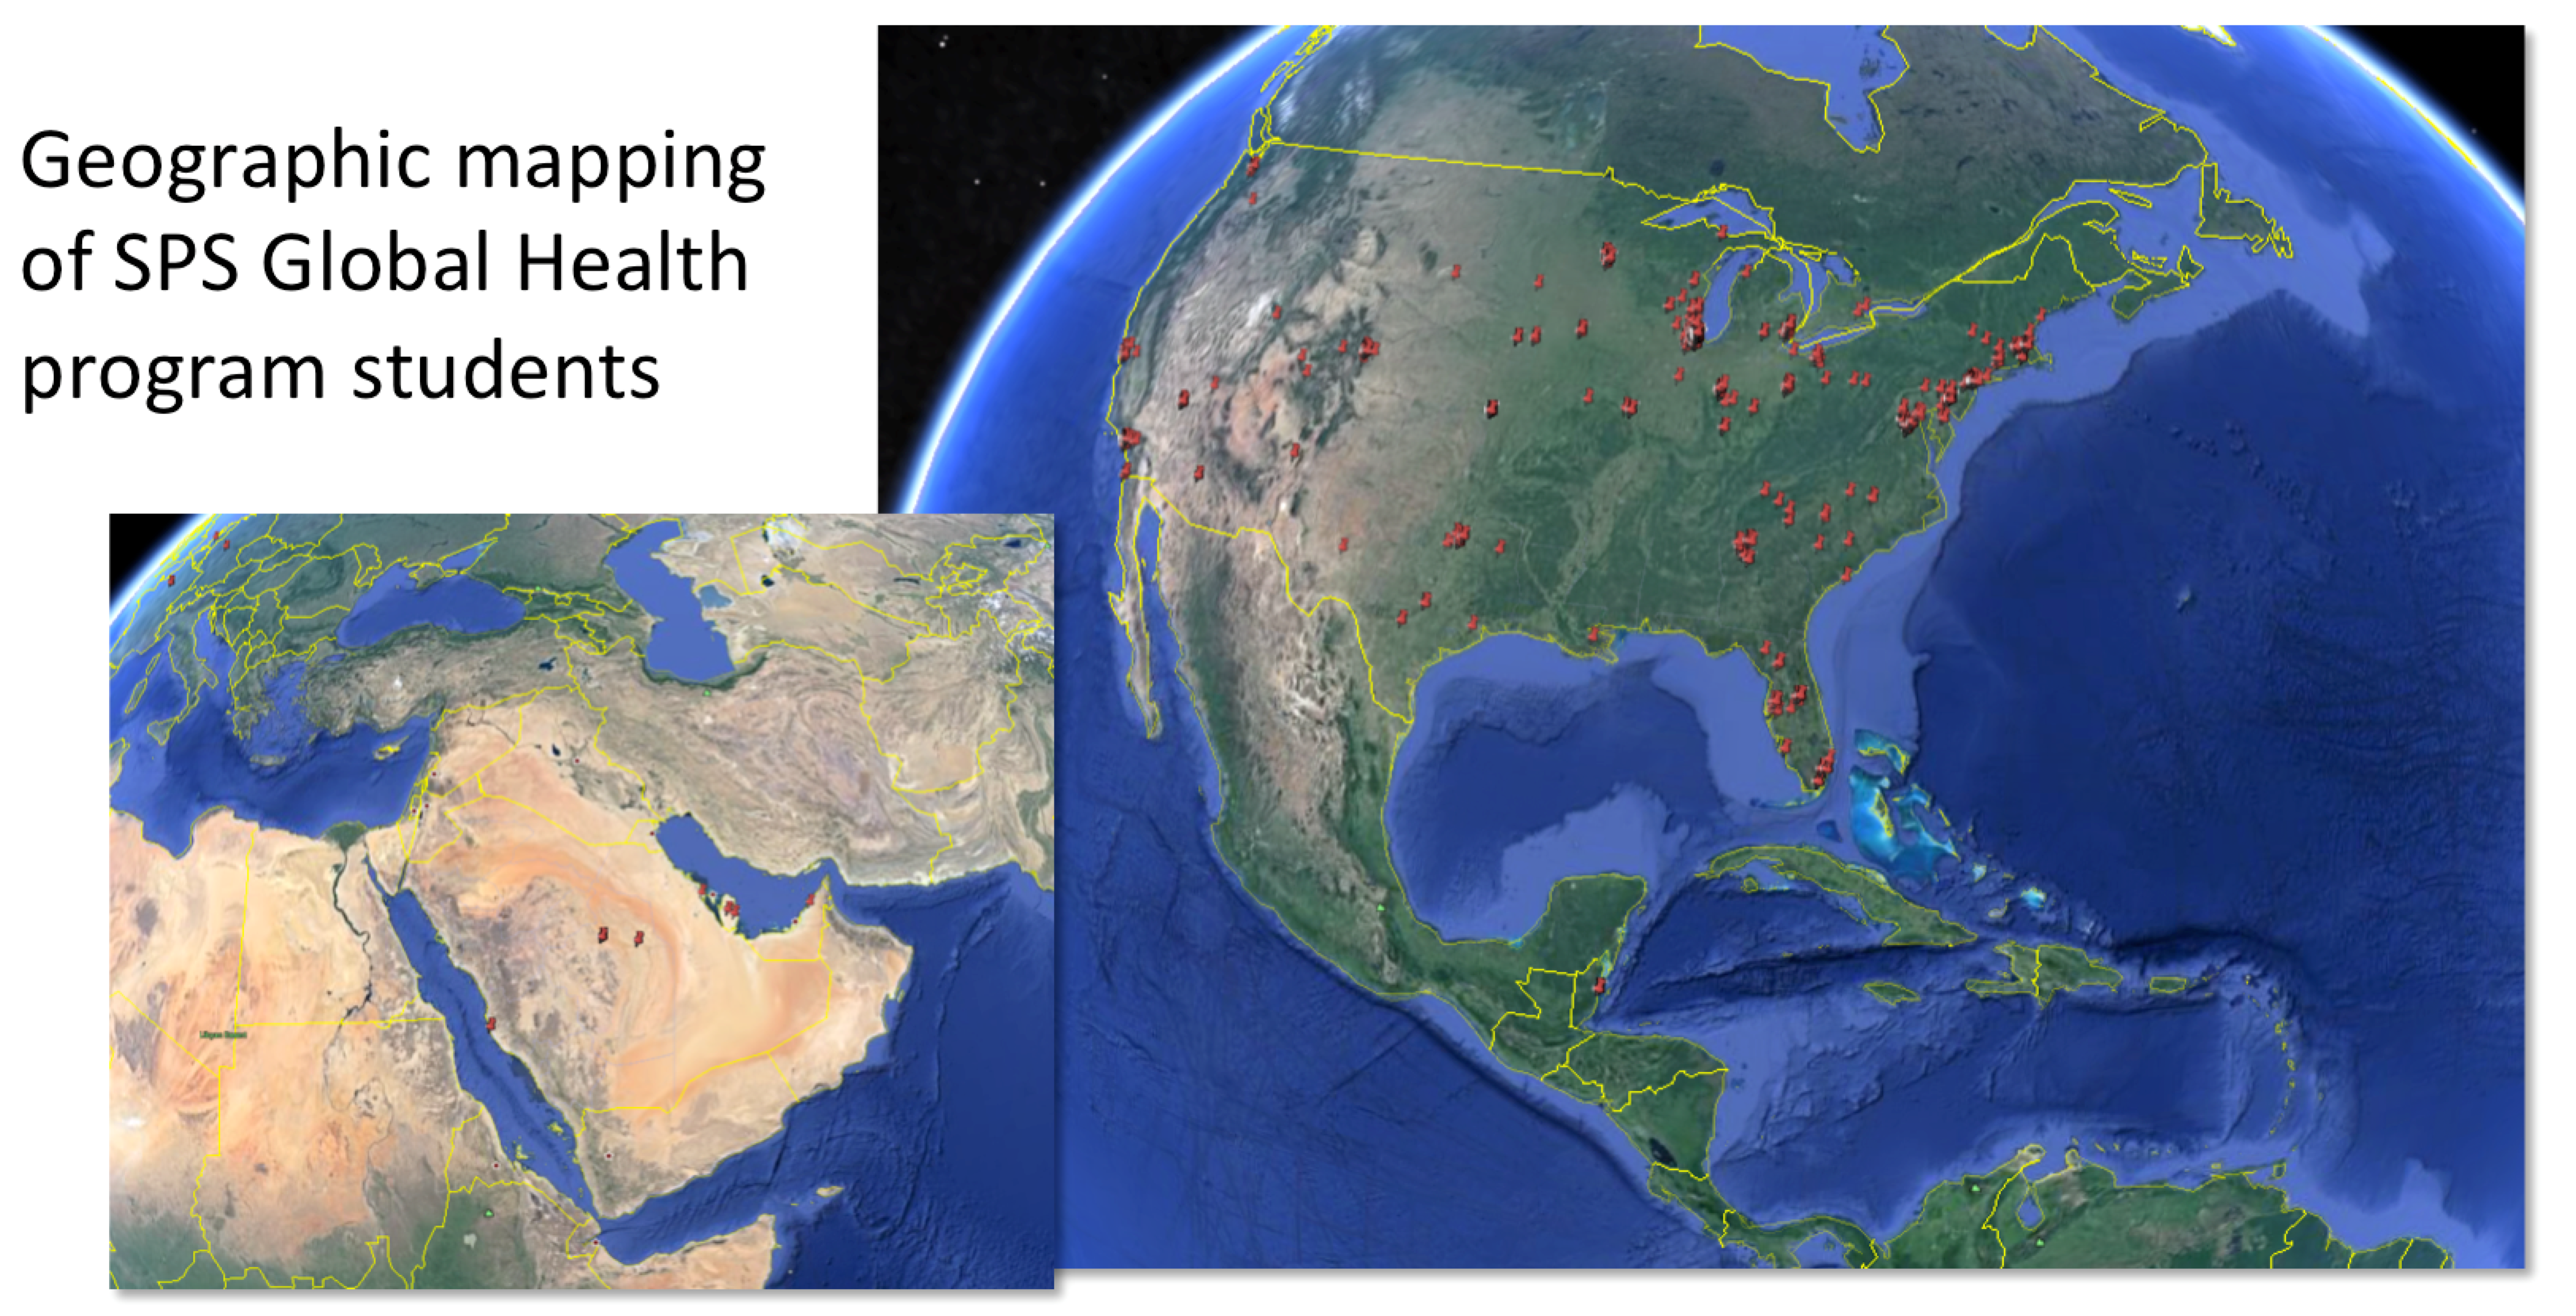 Clickstream Analytics: Geographic, Temporal, and Platform Analysis of Canvas Usage